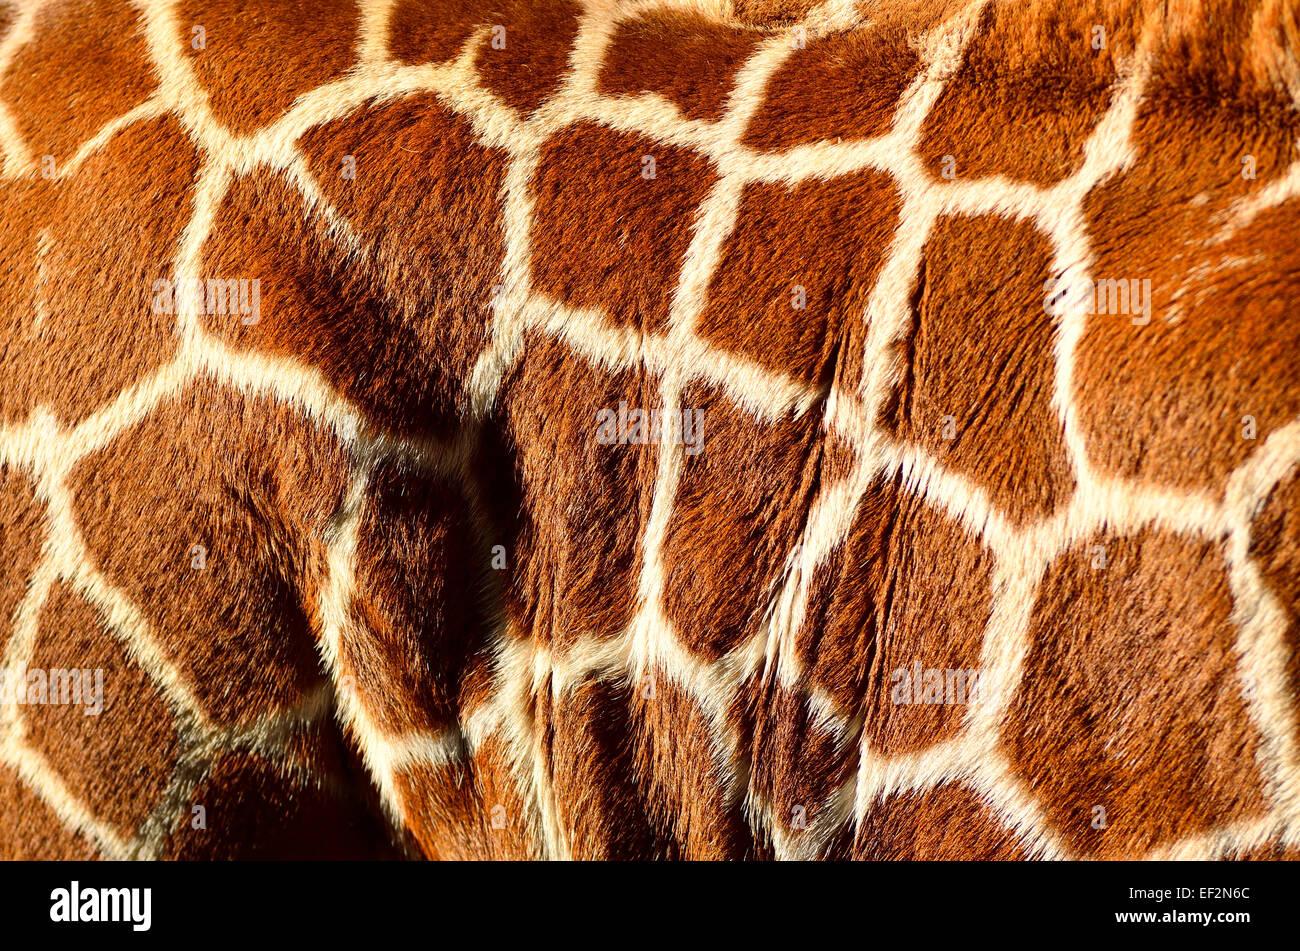 Giraffe body camouflage markings on hide - Stock Image